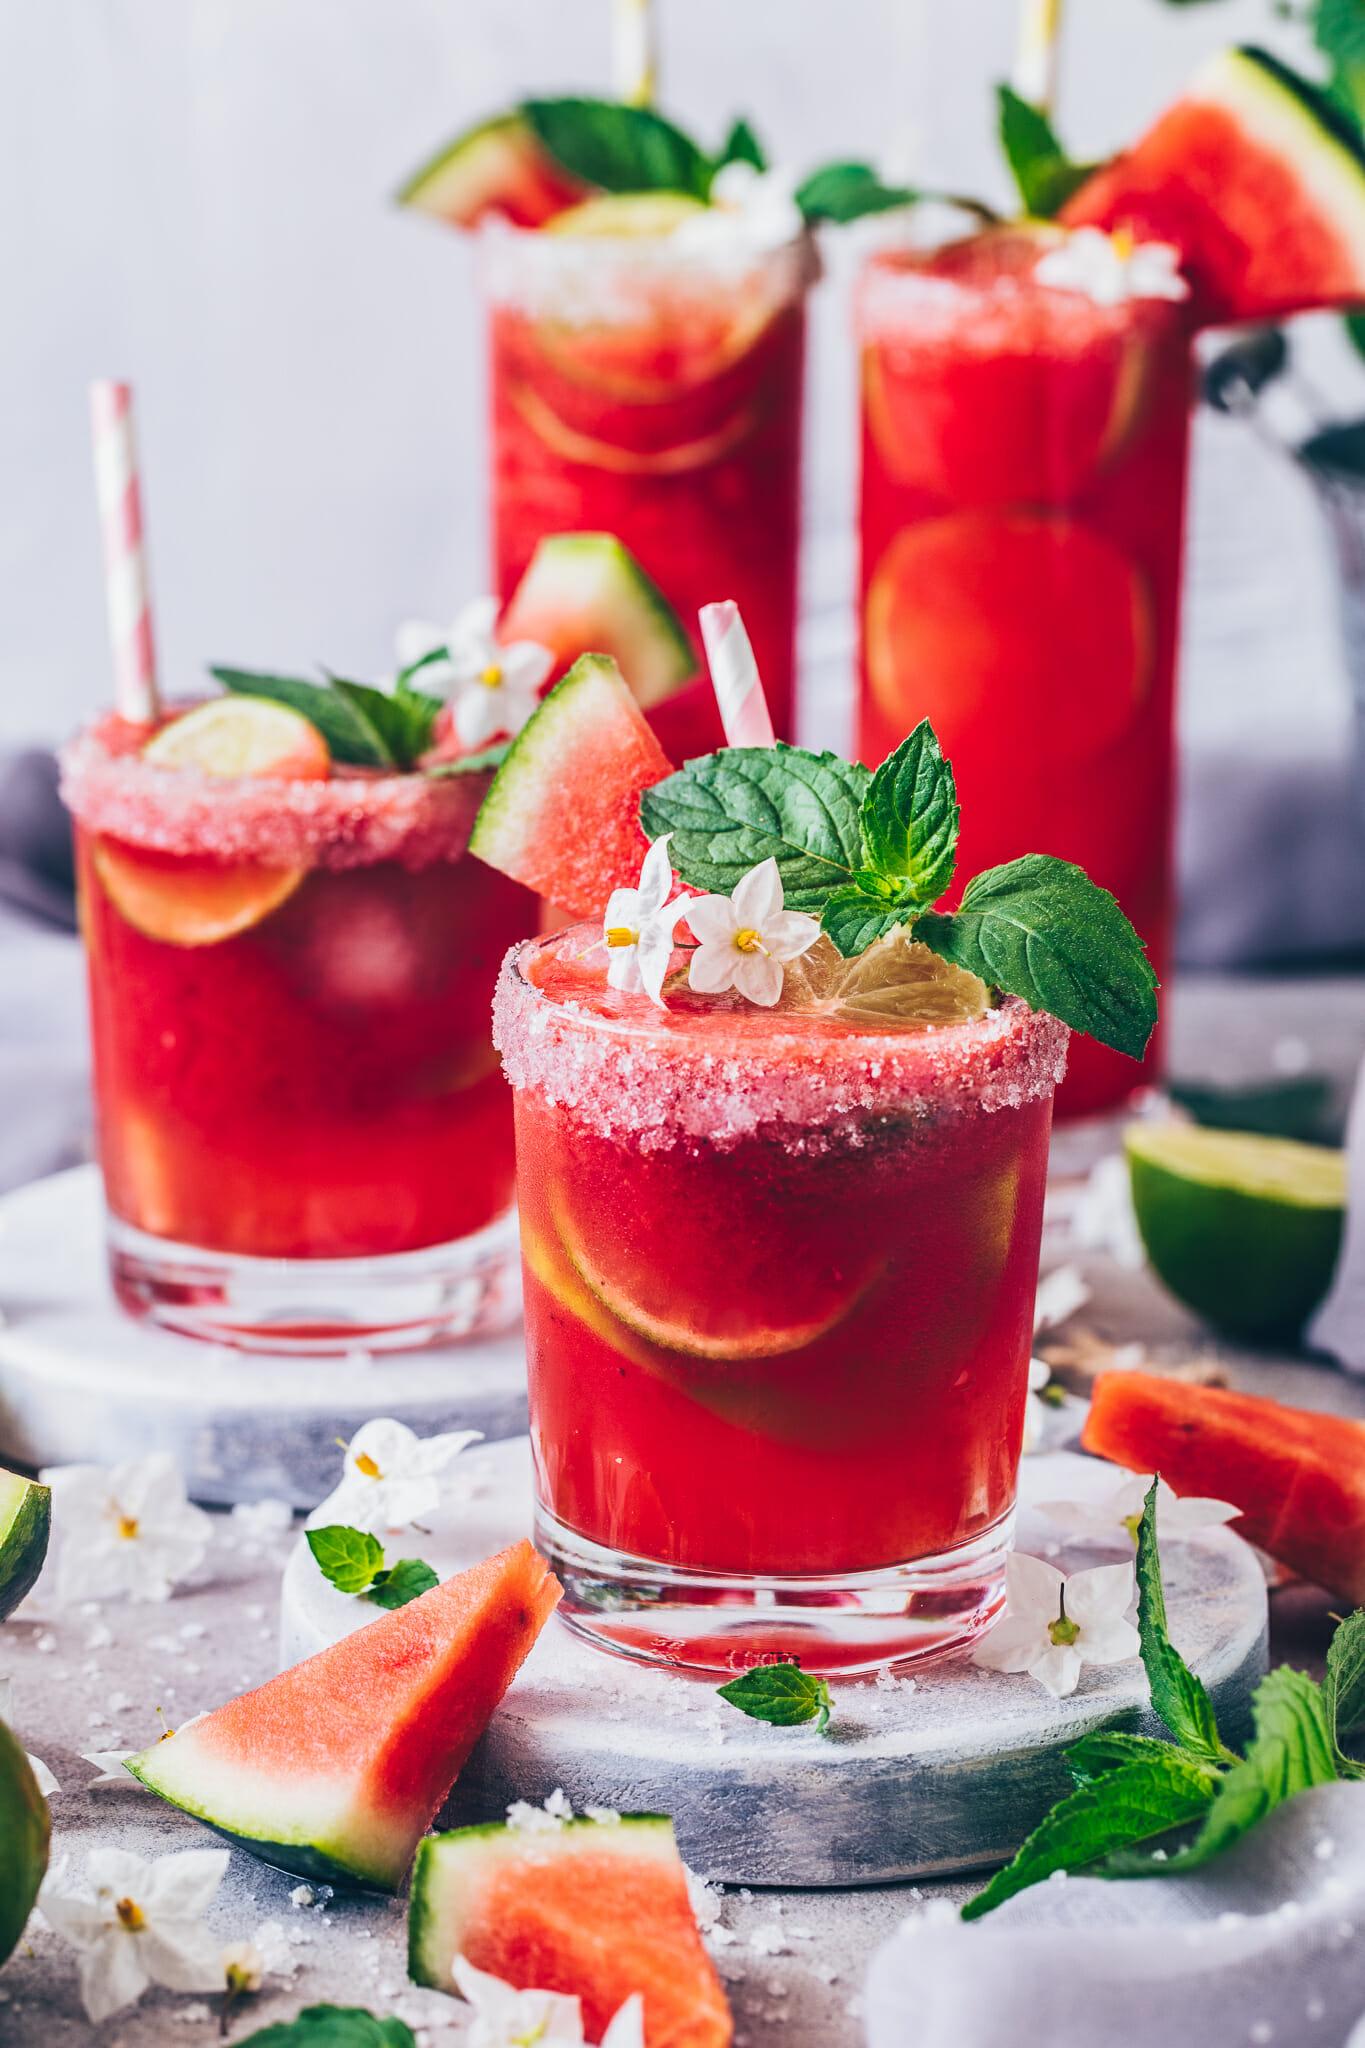 Watermelon Margarita (Frozen Slush Cocktail)